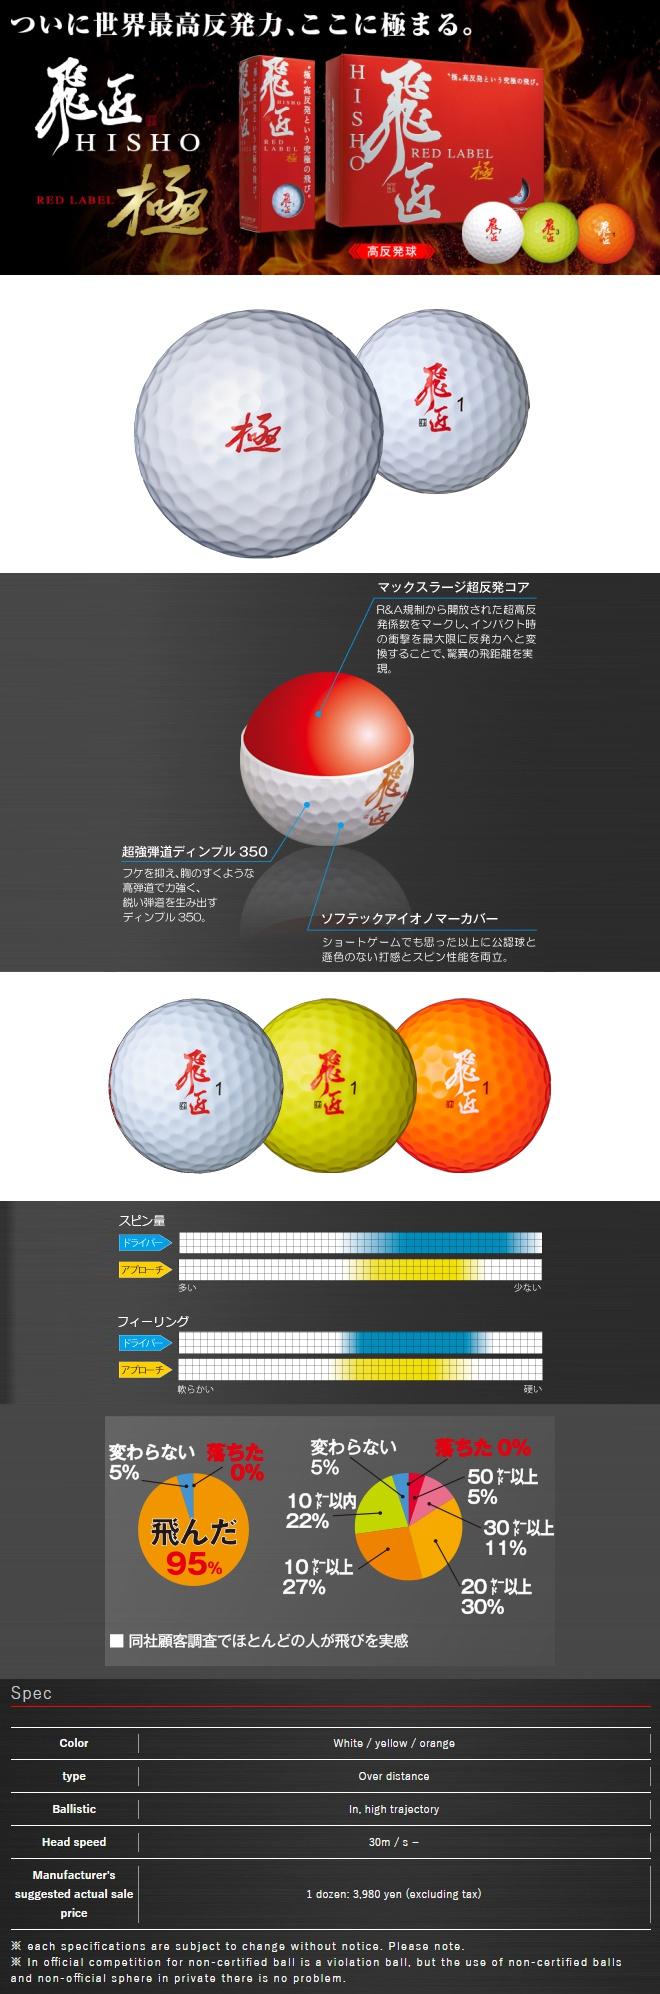 Hisho Non Conforming Kiwami Red Label Ball